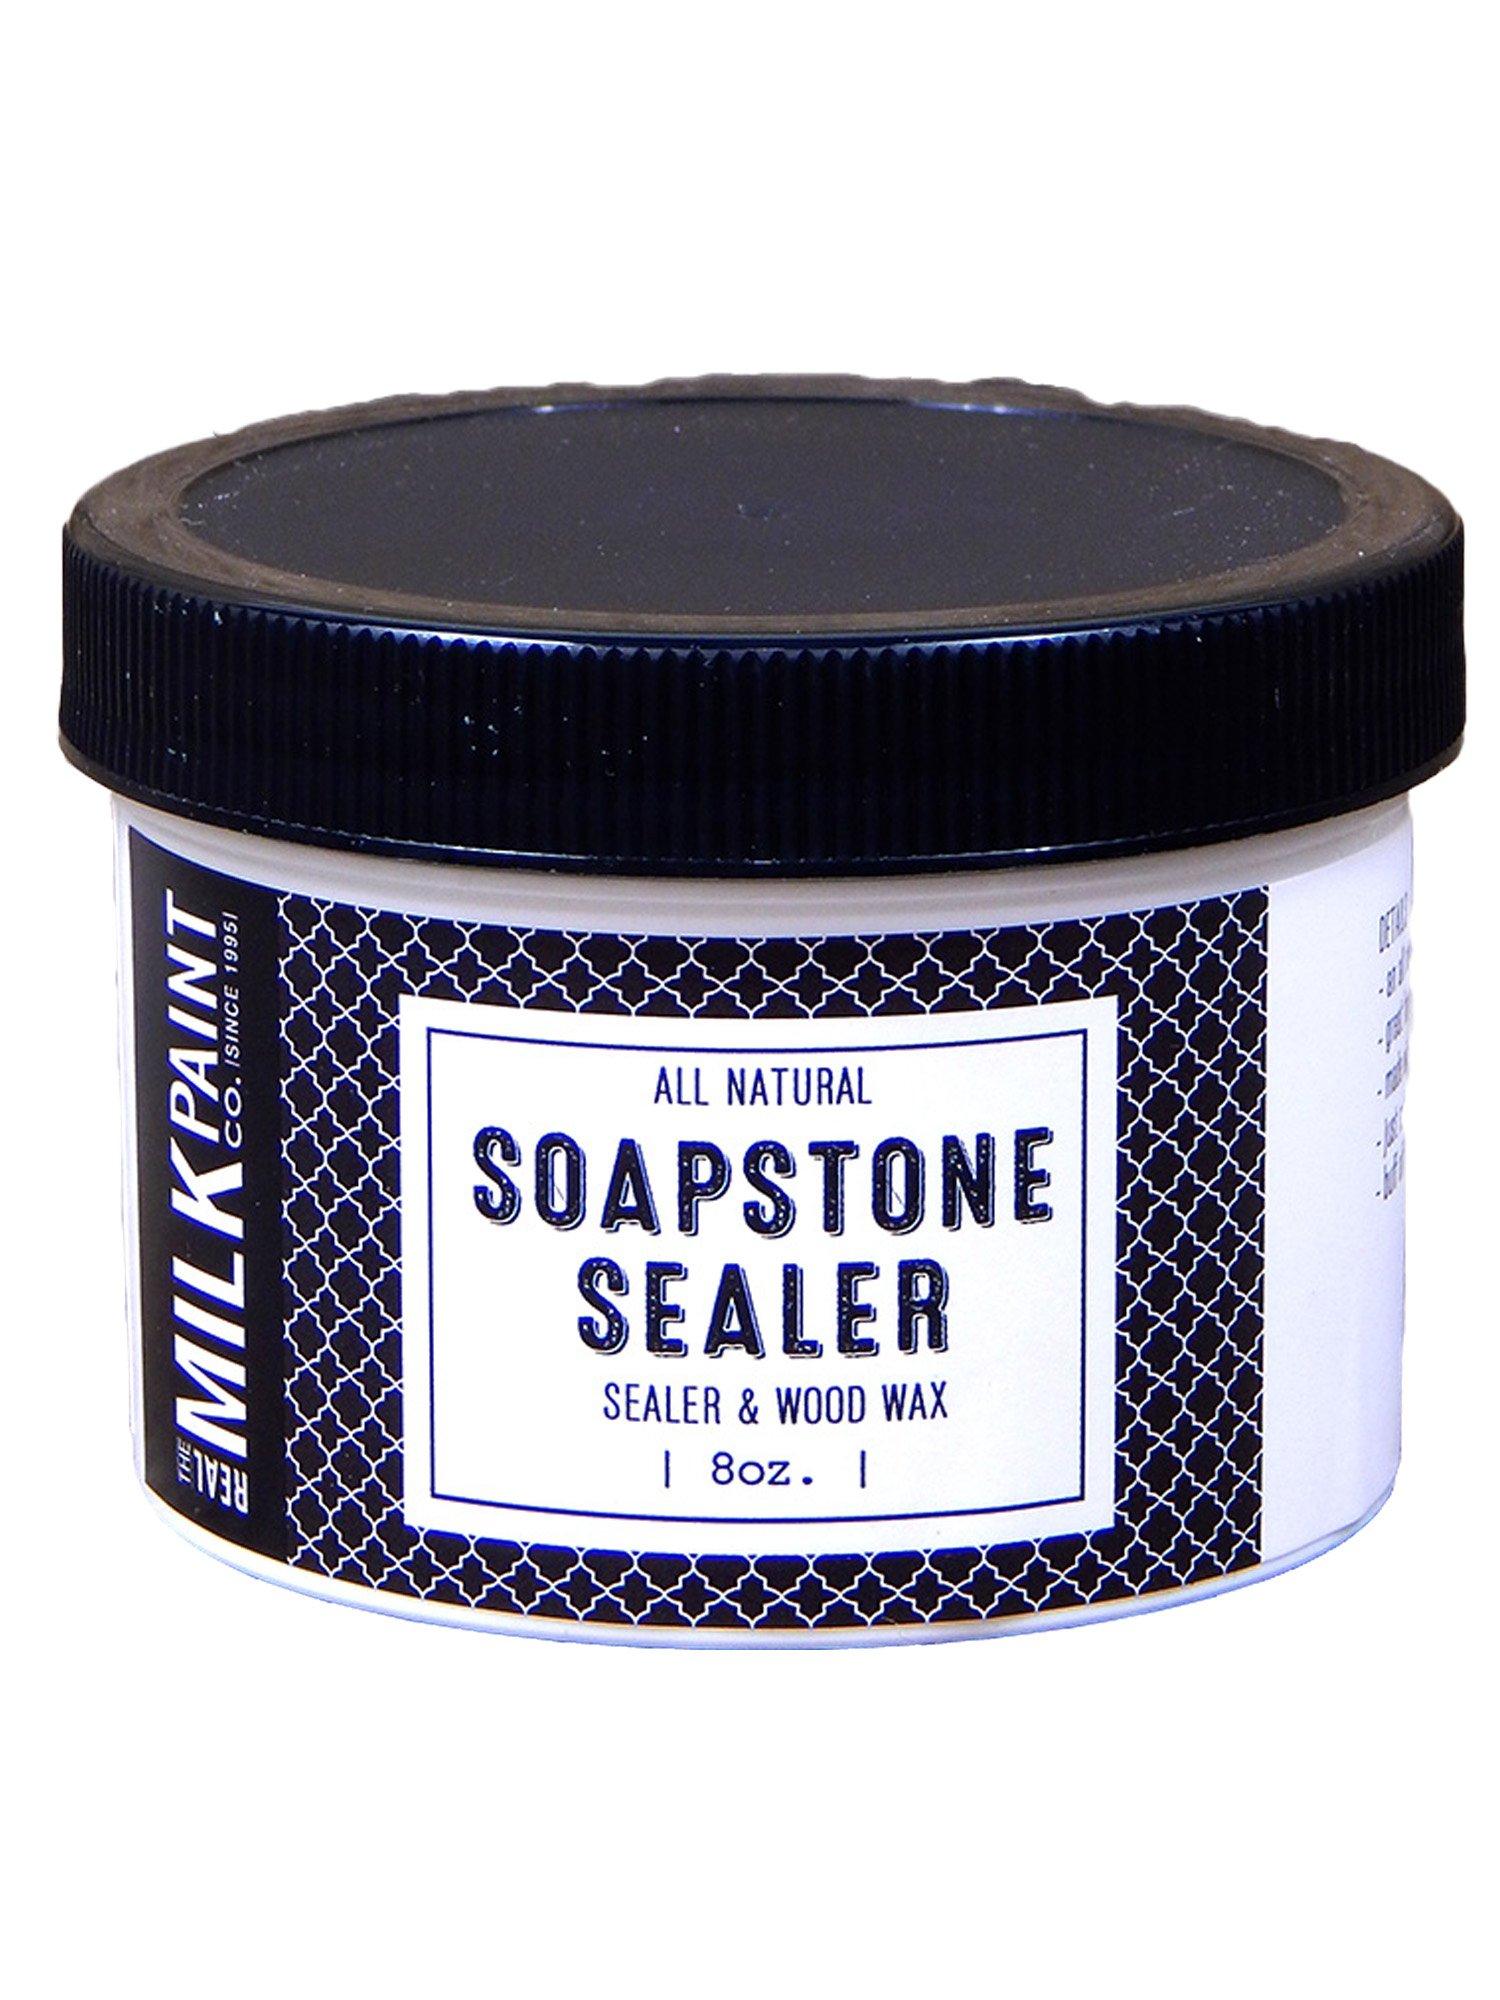 Soapstone Sealer and Wood Wax-8 oz.